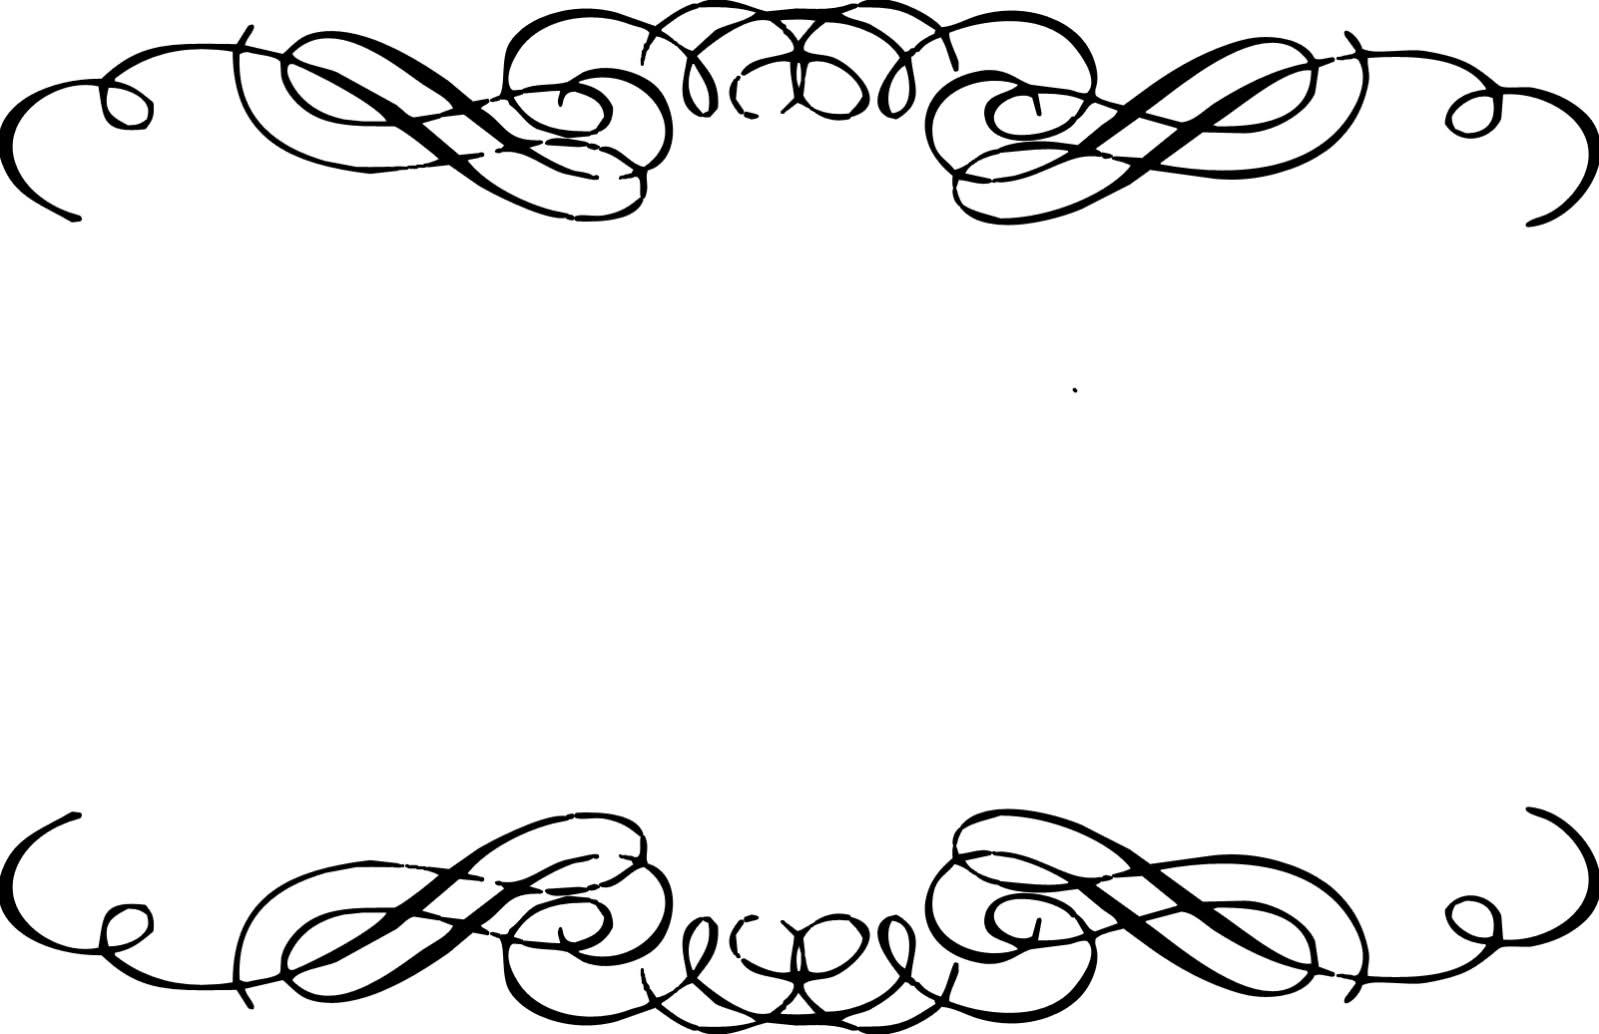 1599x1034 Scroll Border Clip Art Many Interesting Cliparts